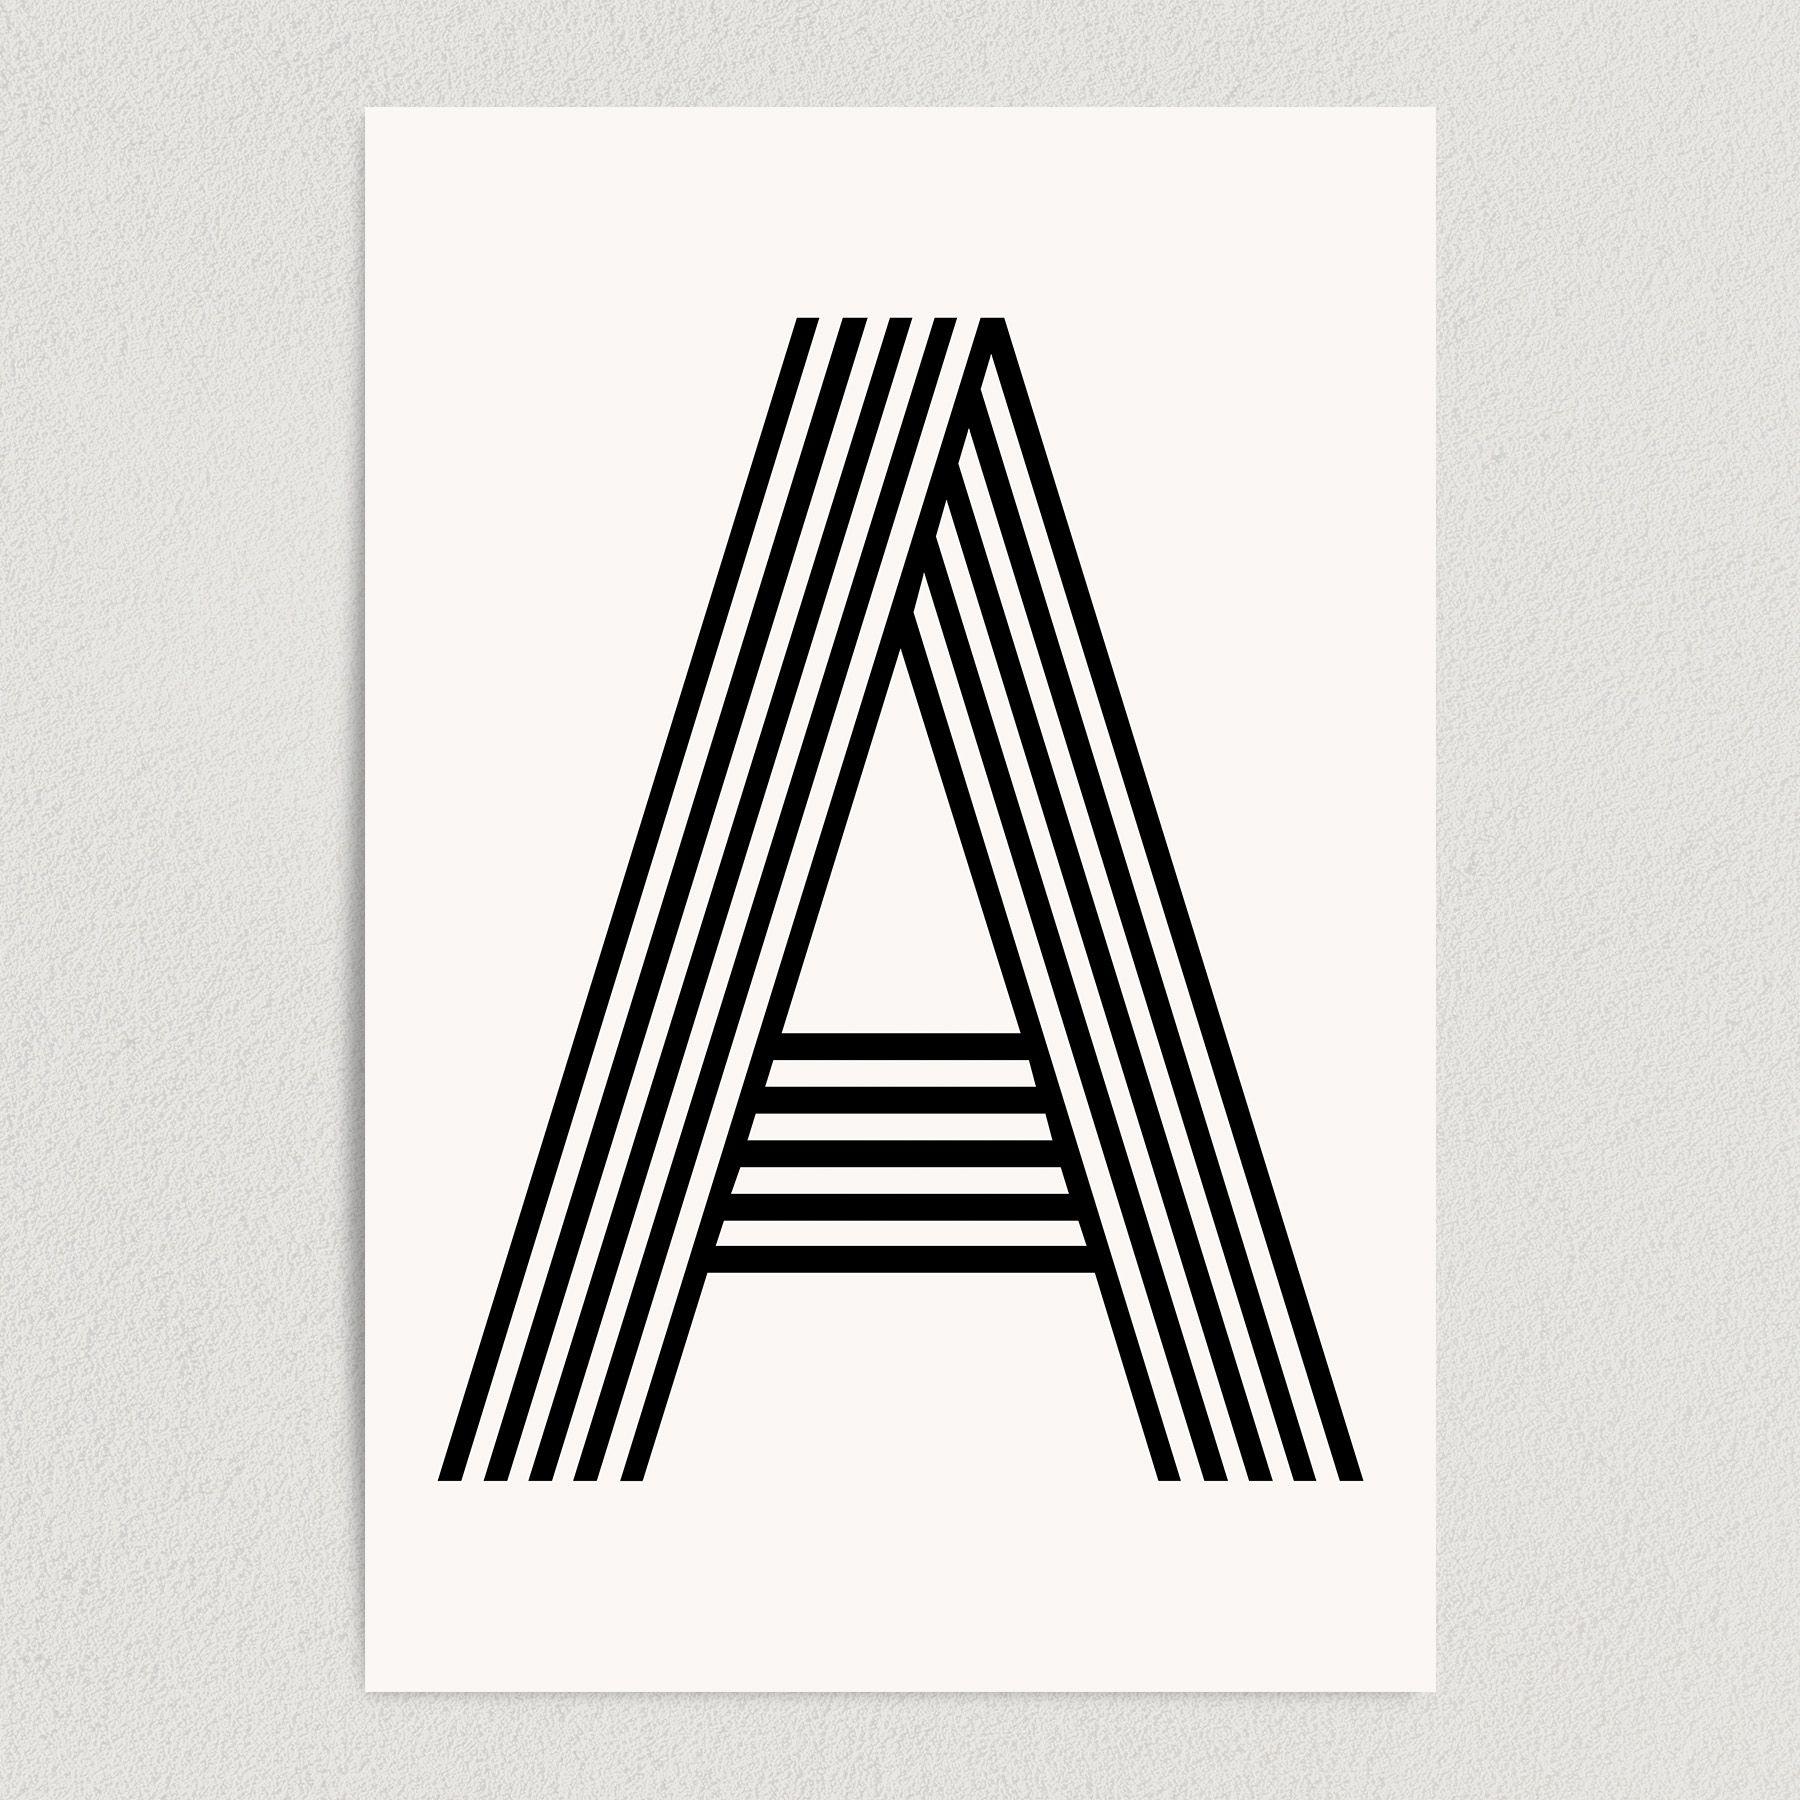 Letter A Modern Typography Art Print Poster 12″ x 18″ Wall Art M2160